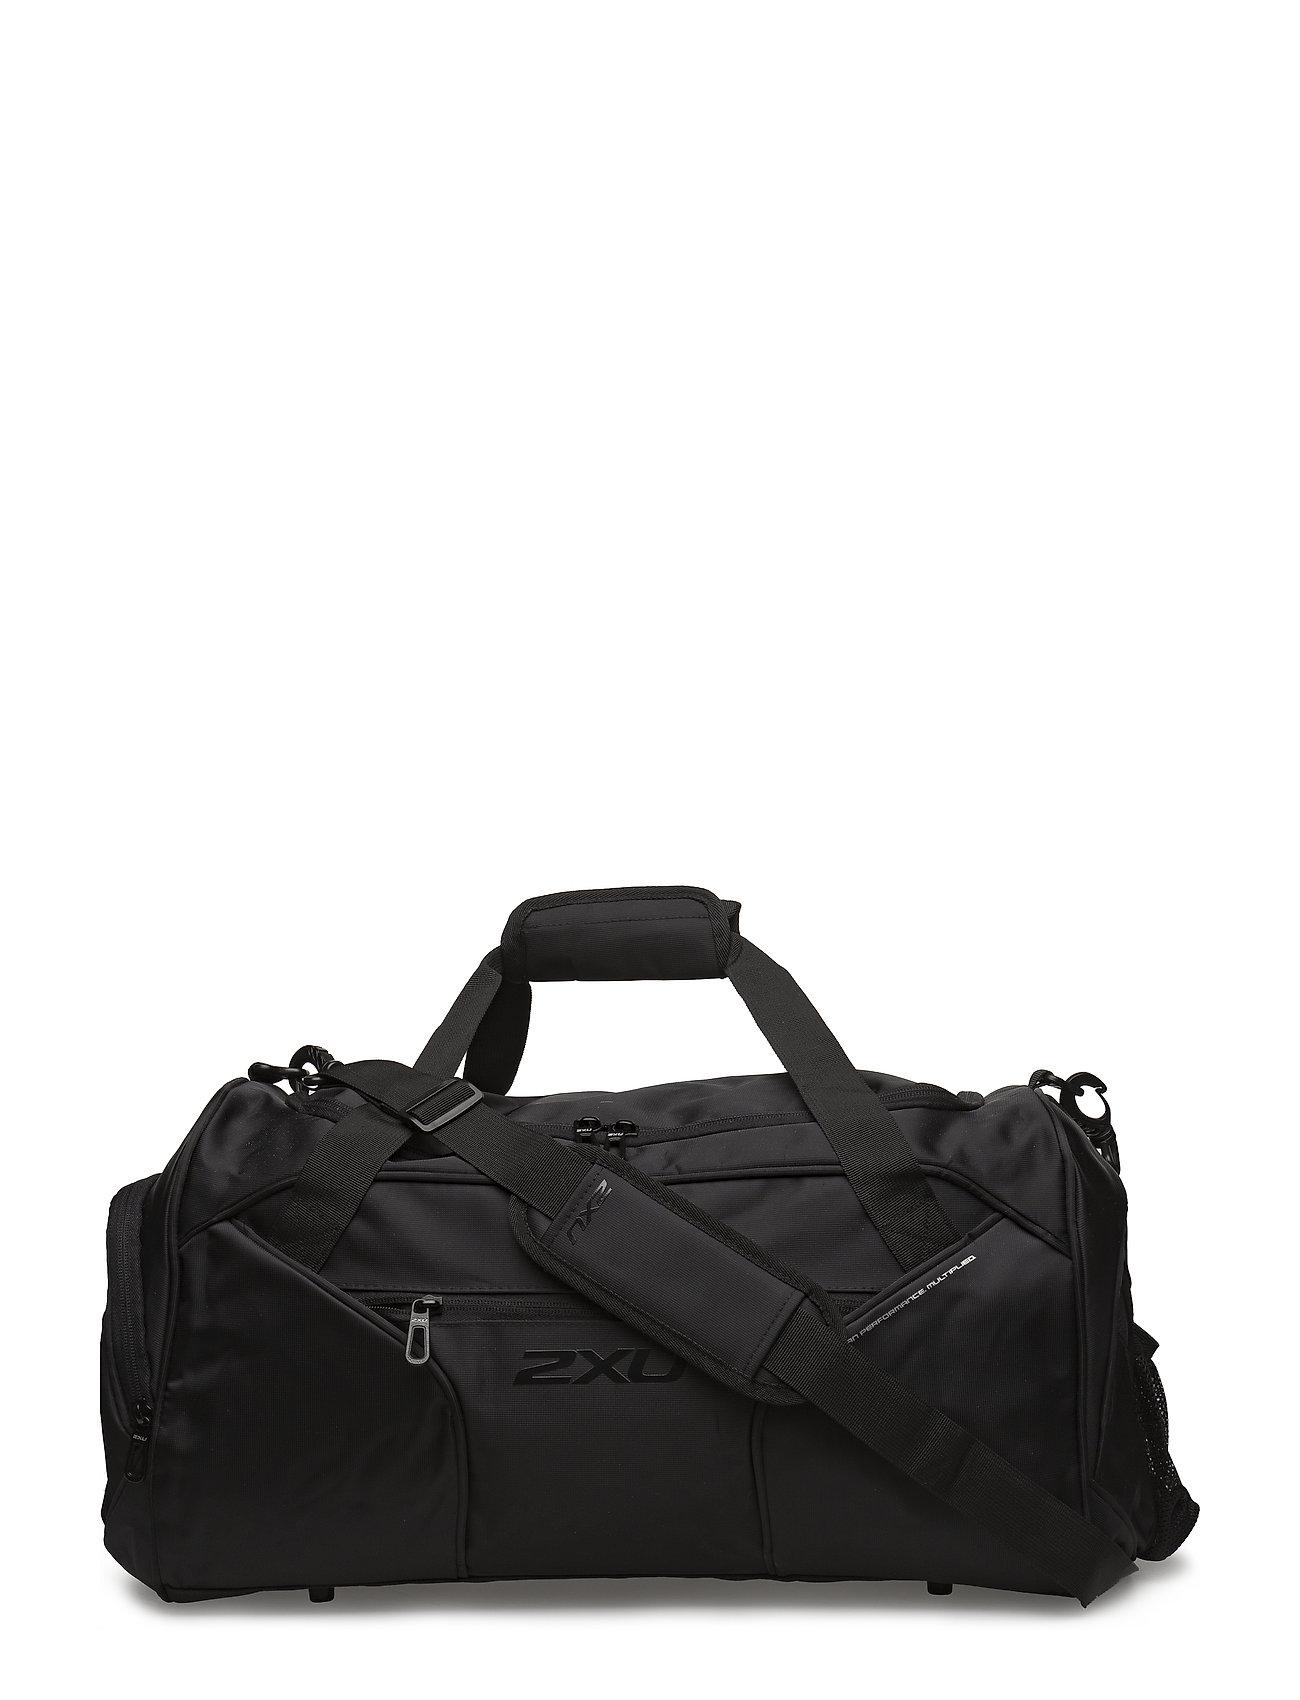 Image of Gym Bag Sportstaske Sort 2XU (3441400141)